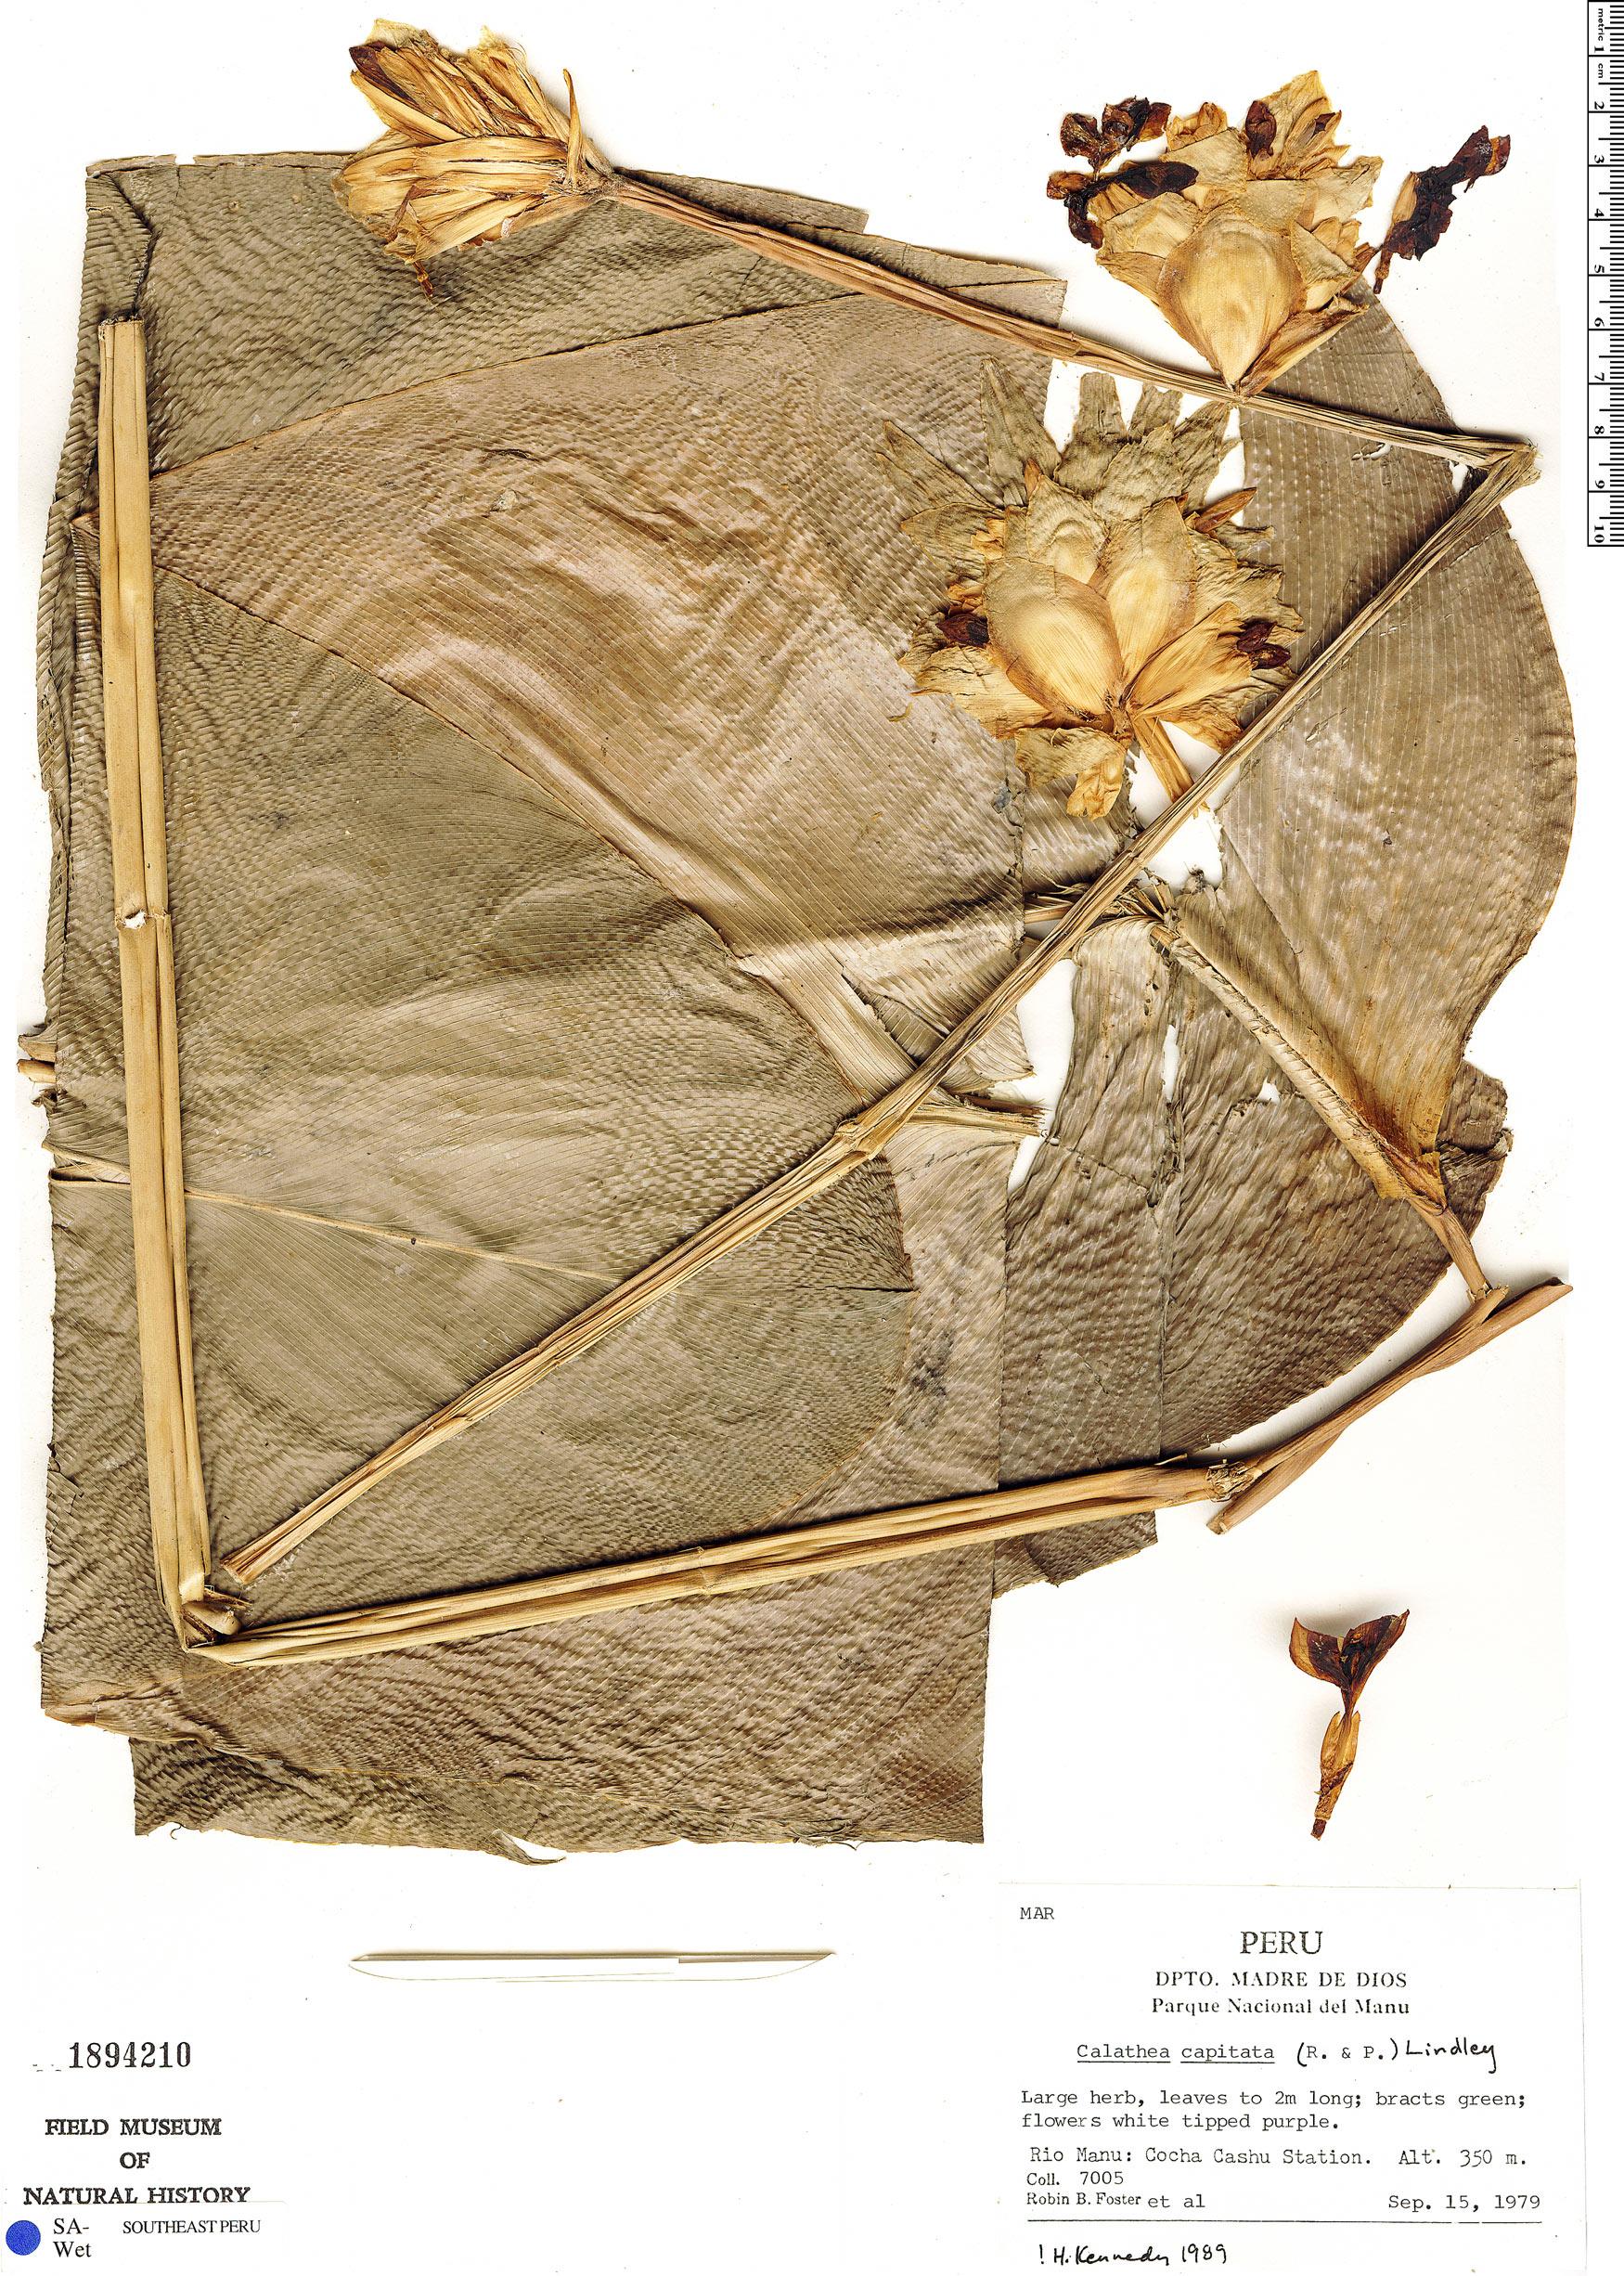 Espécime: Calathea capitata